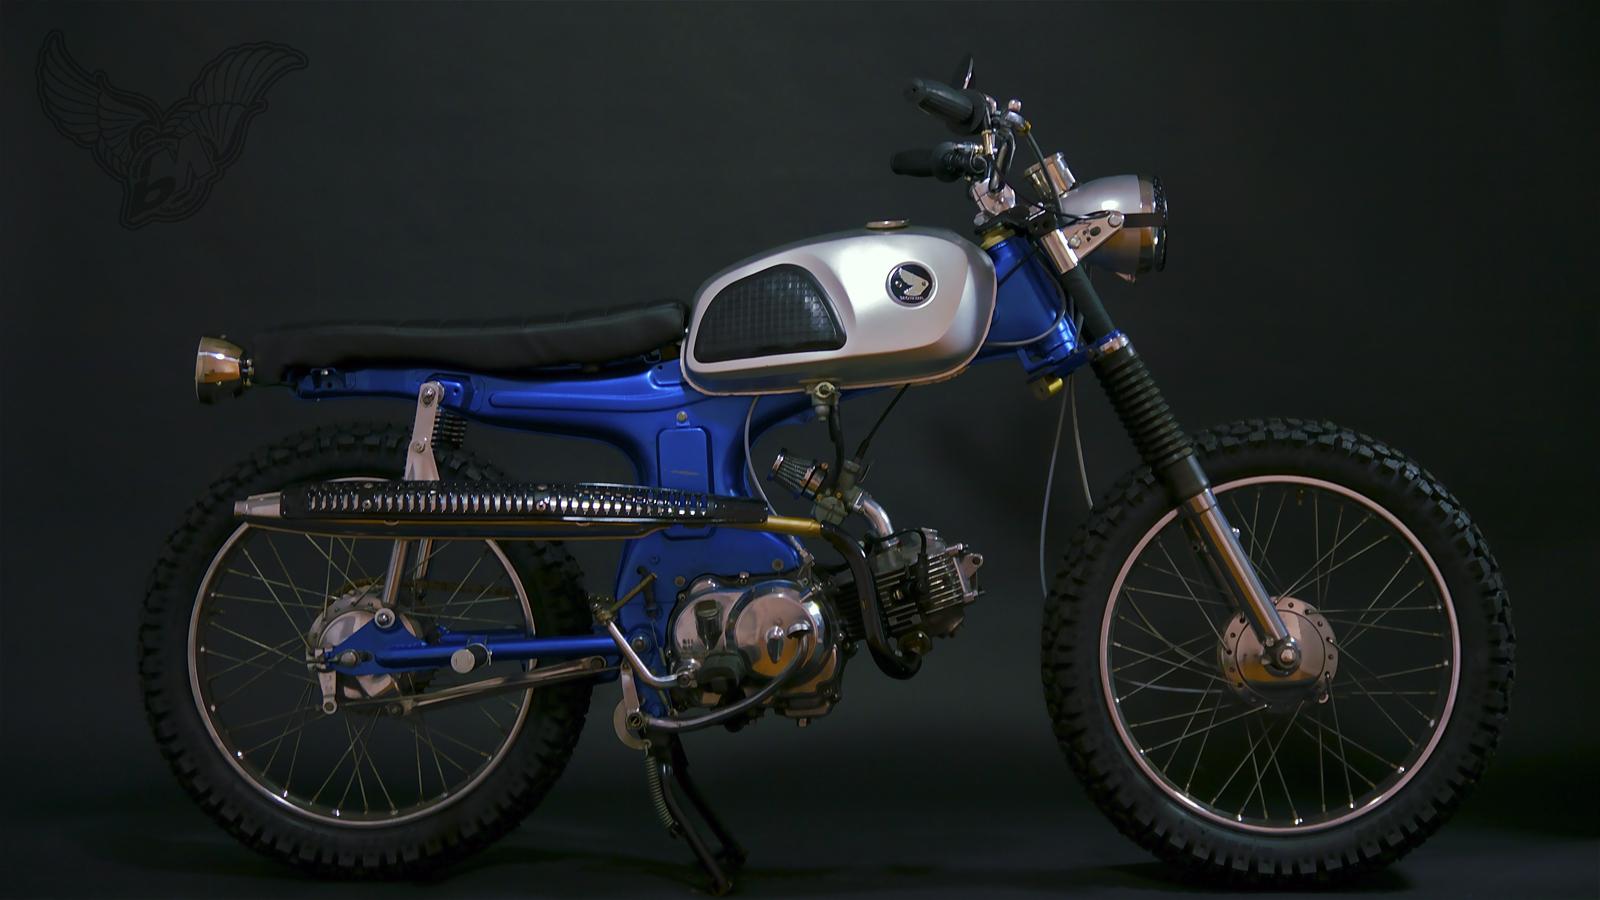 Honda Dirt Bike Frames